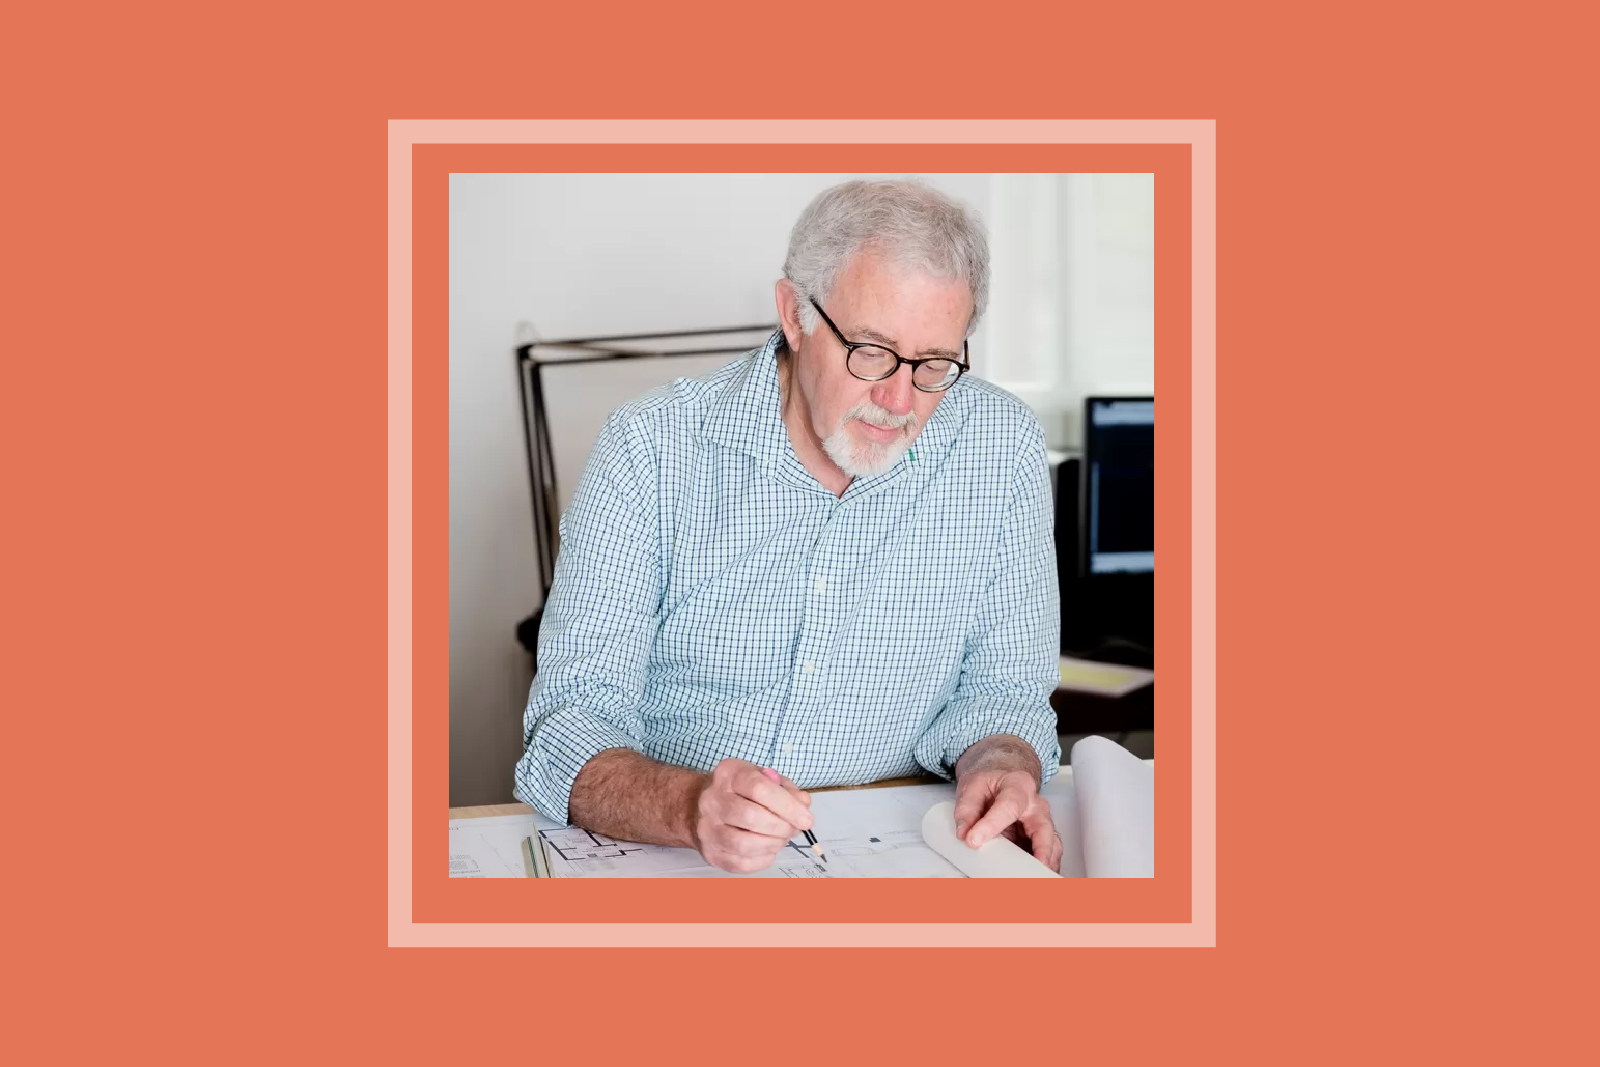 Charles Travis sketching at his desk.